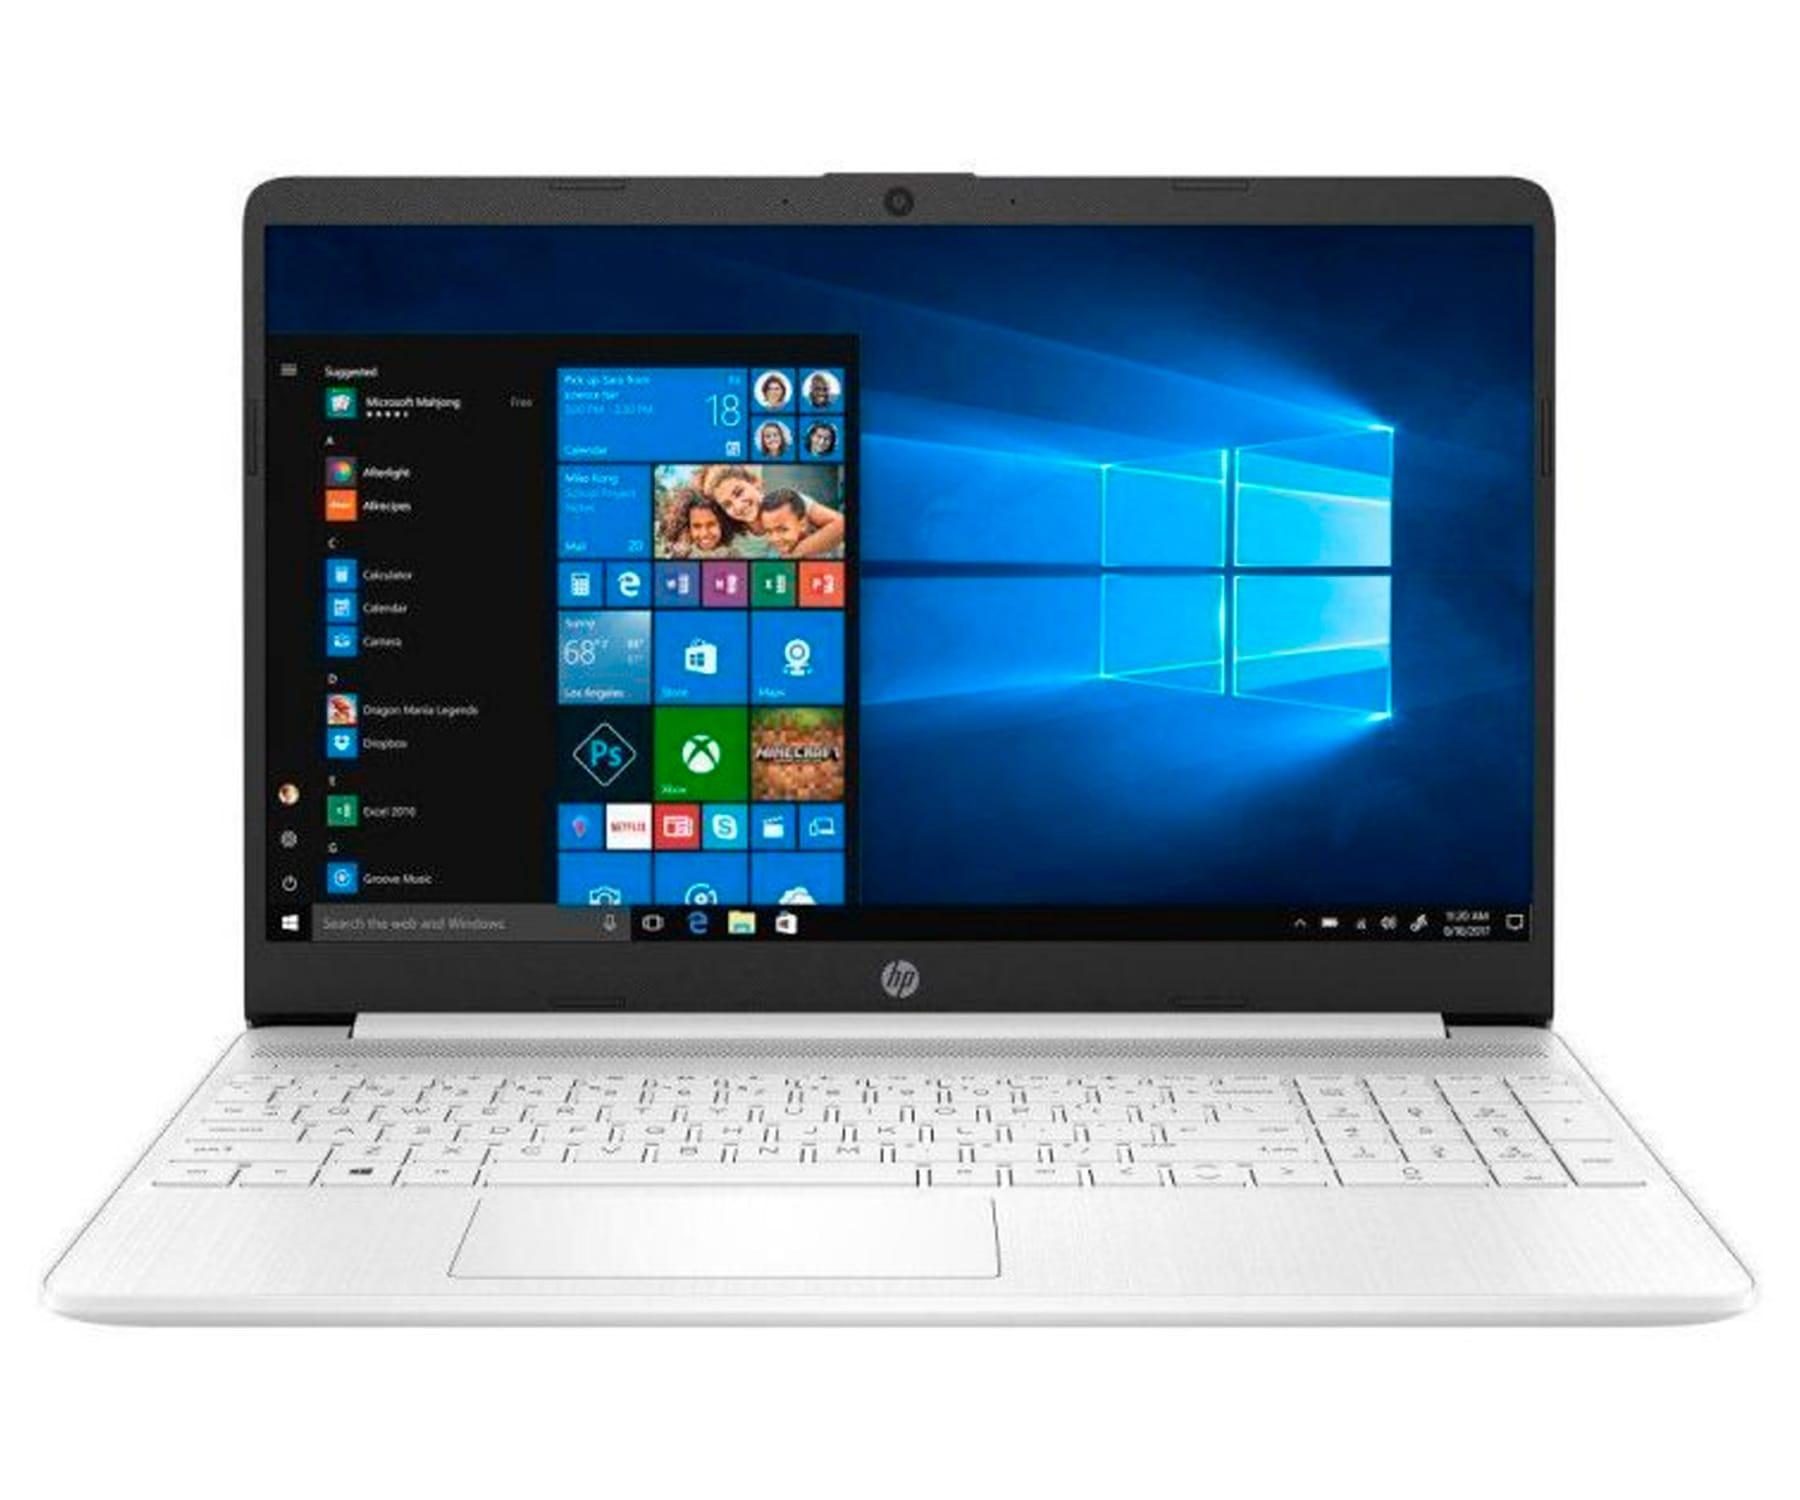 HP 15s-FQ1038 BLANCO PORTÁTIL 15.6'' HD i5-1035G1 256GB SSD 8GB RAM WINDOWS 10 HOME